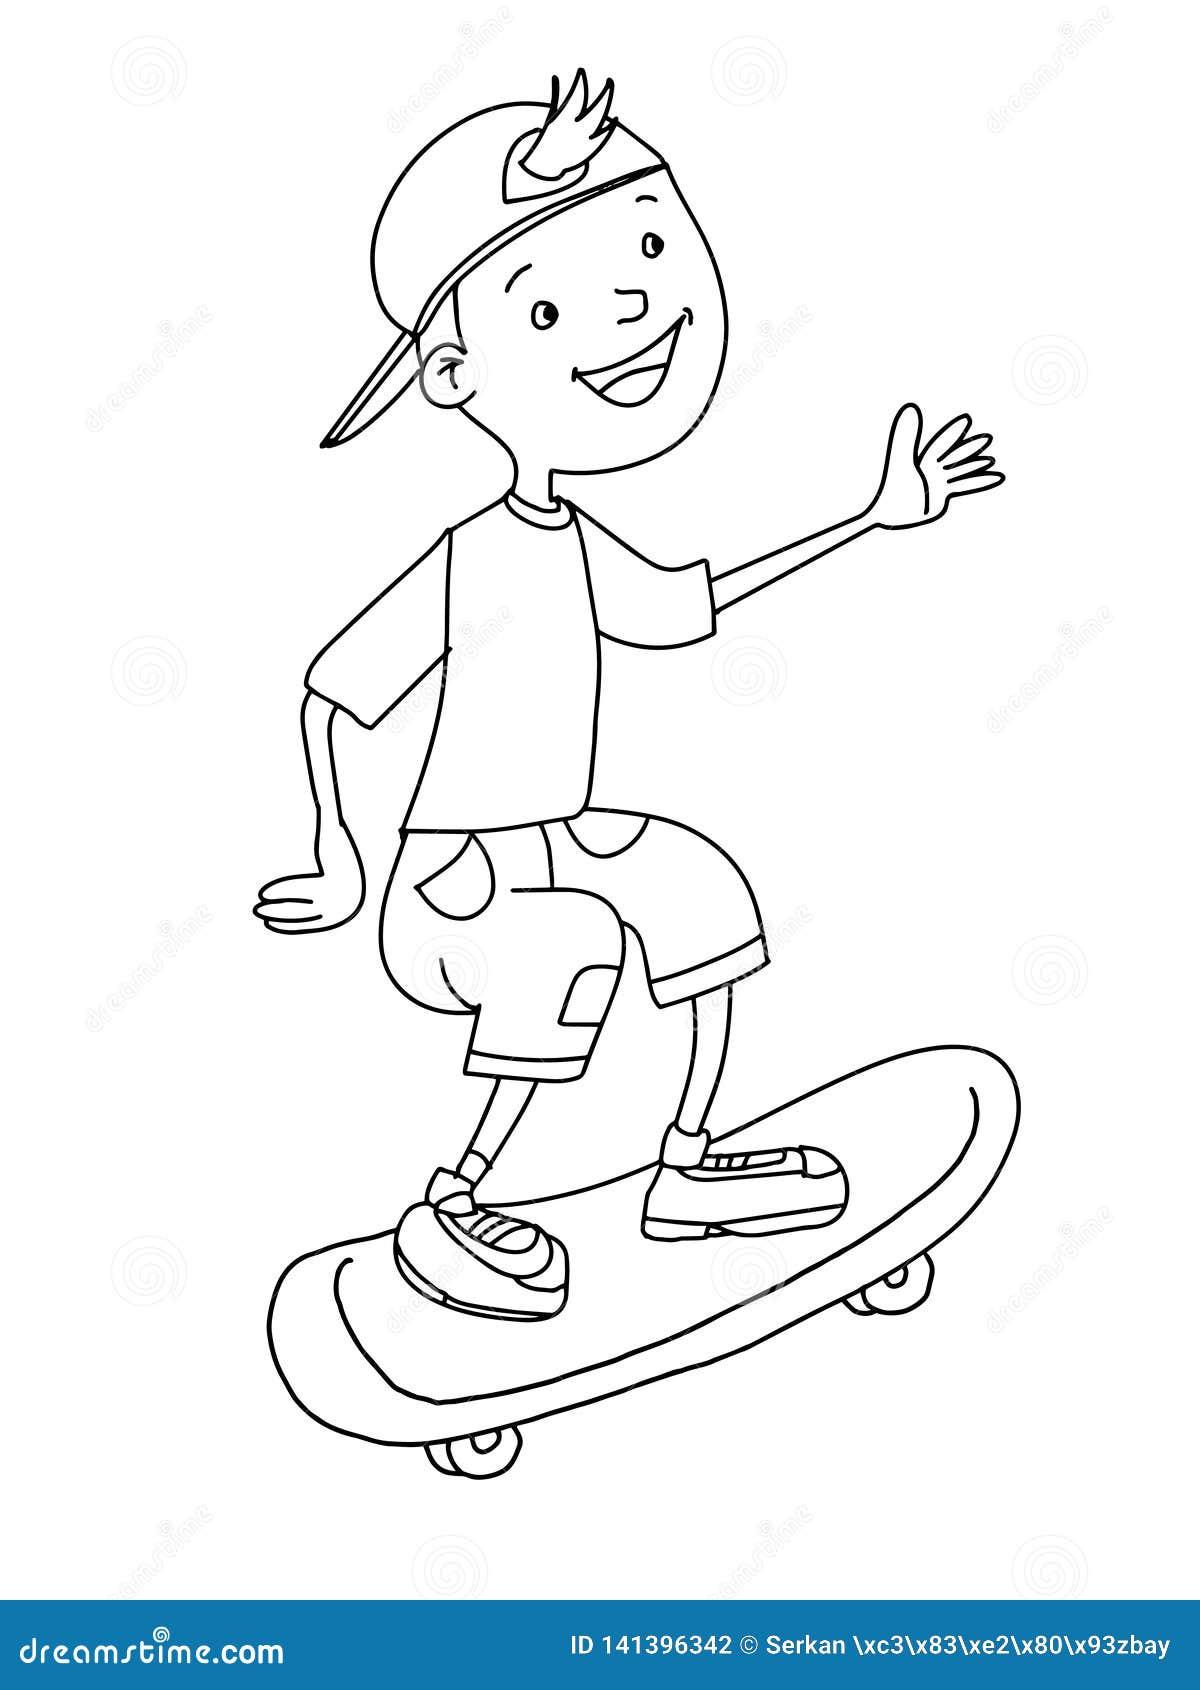 Cute Boy Cartoon Illustration Skating Drawing Line ...